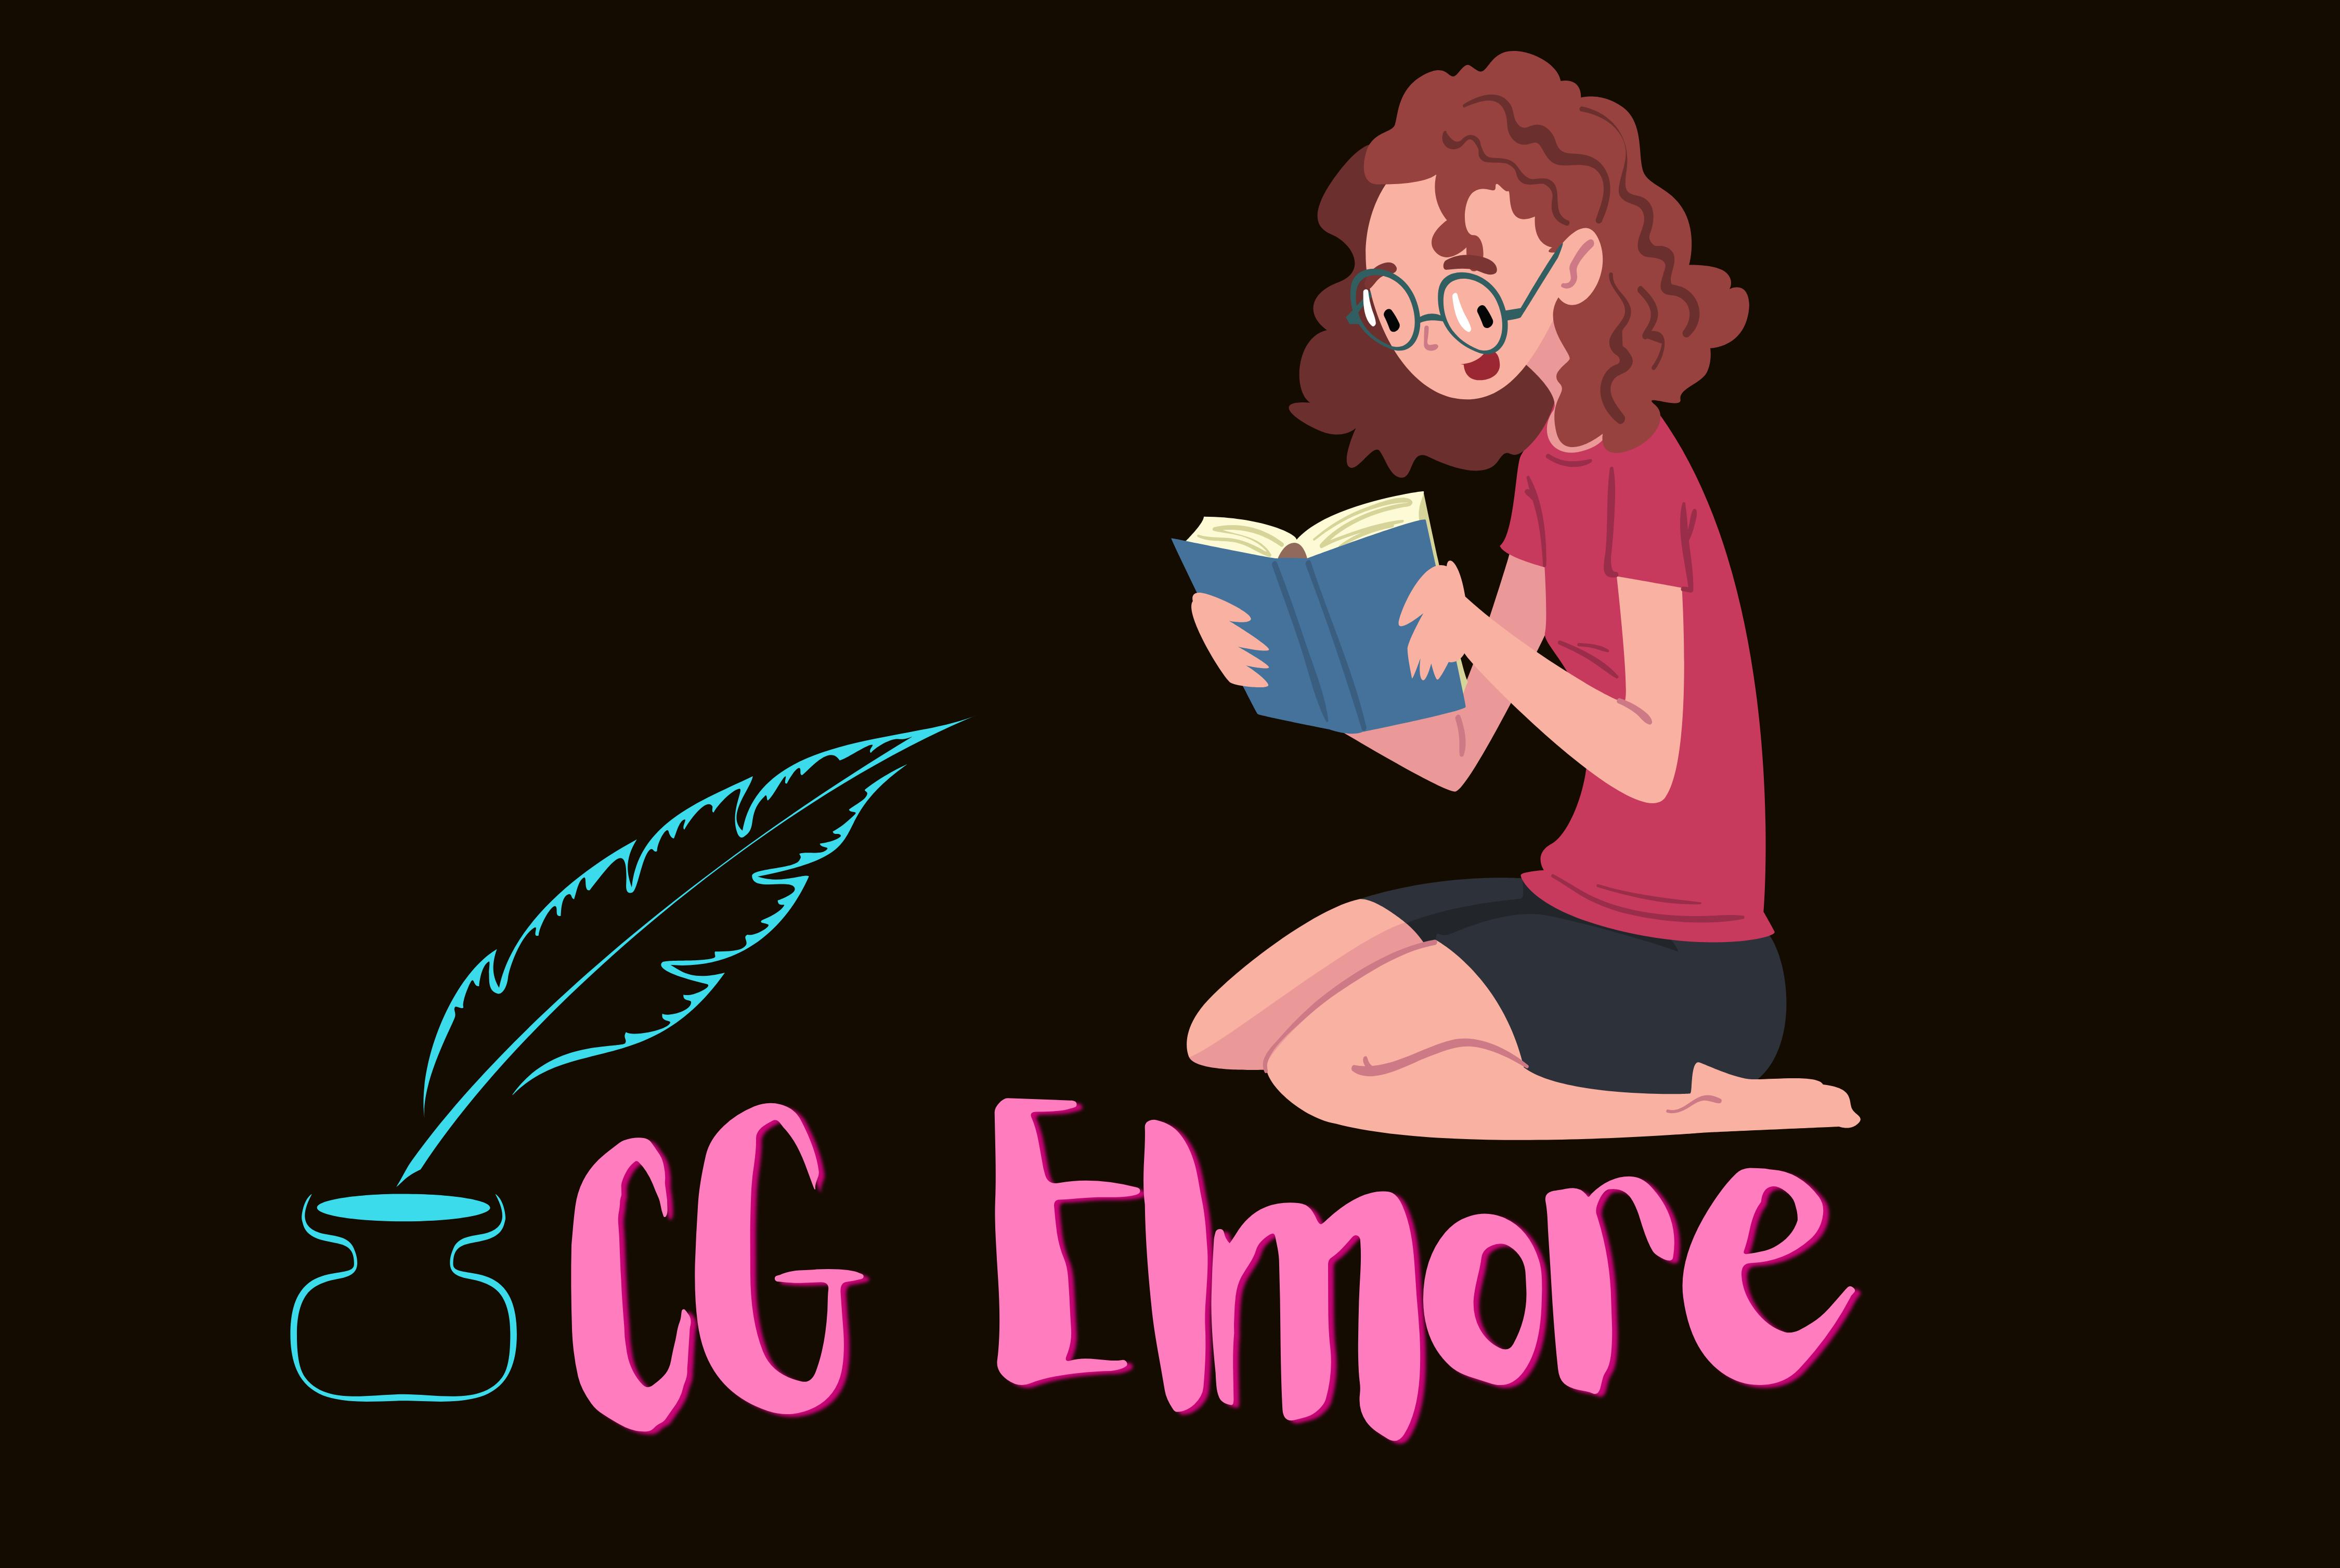 C.G. Elmore